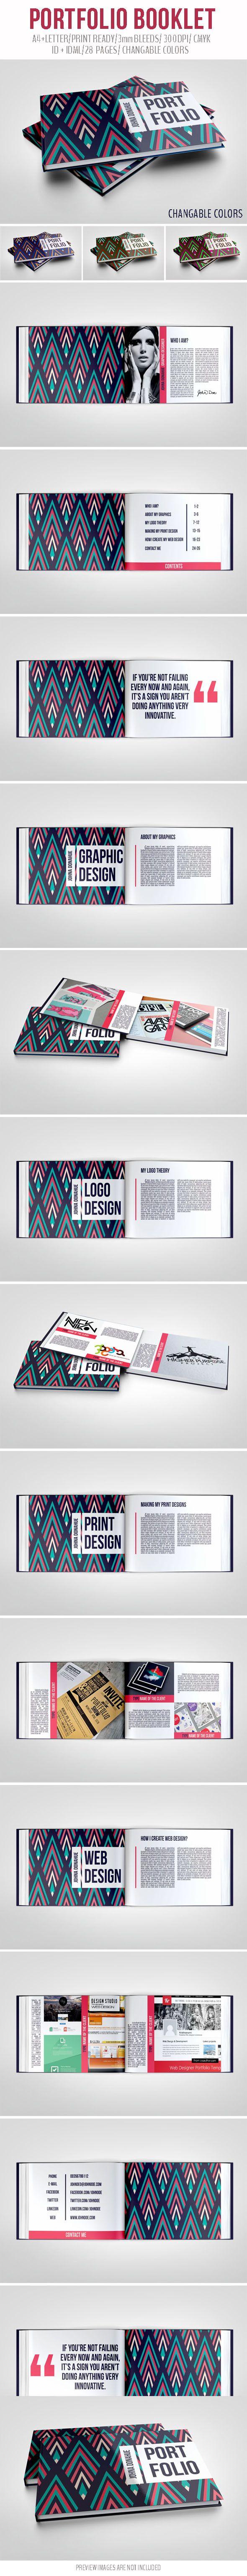 Portfolio Booklet by crew55design, via Behance